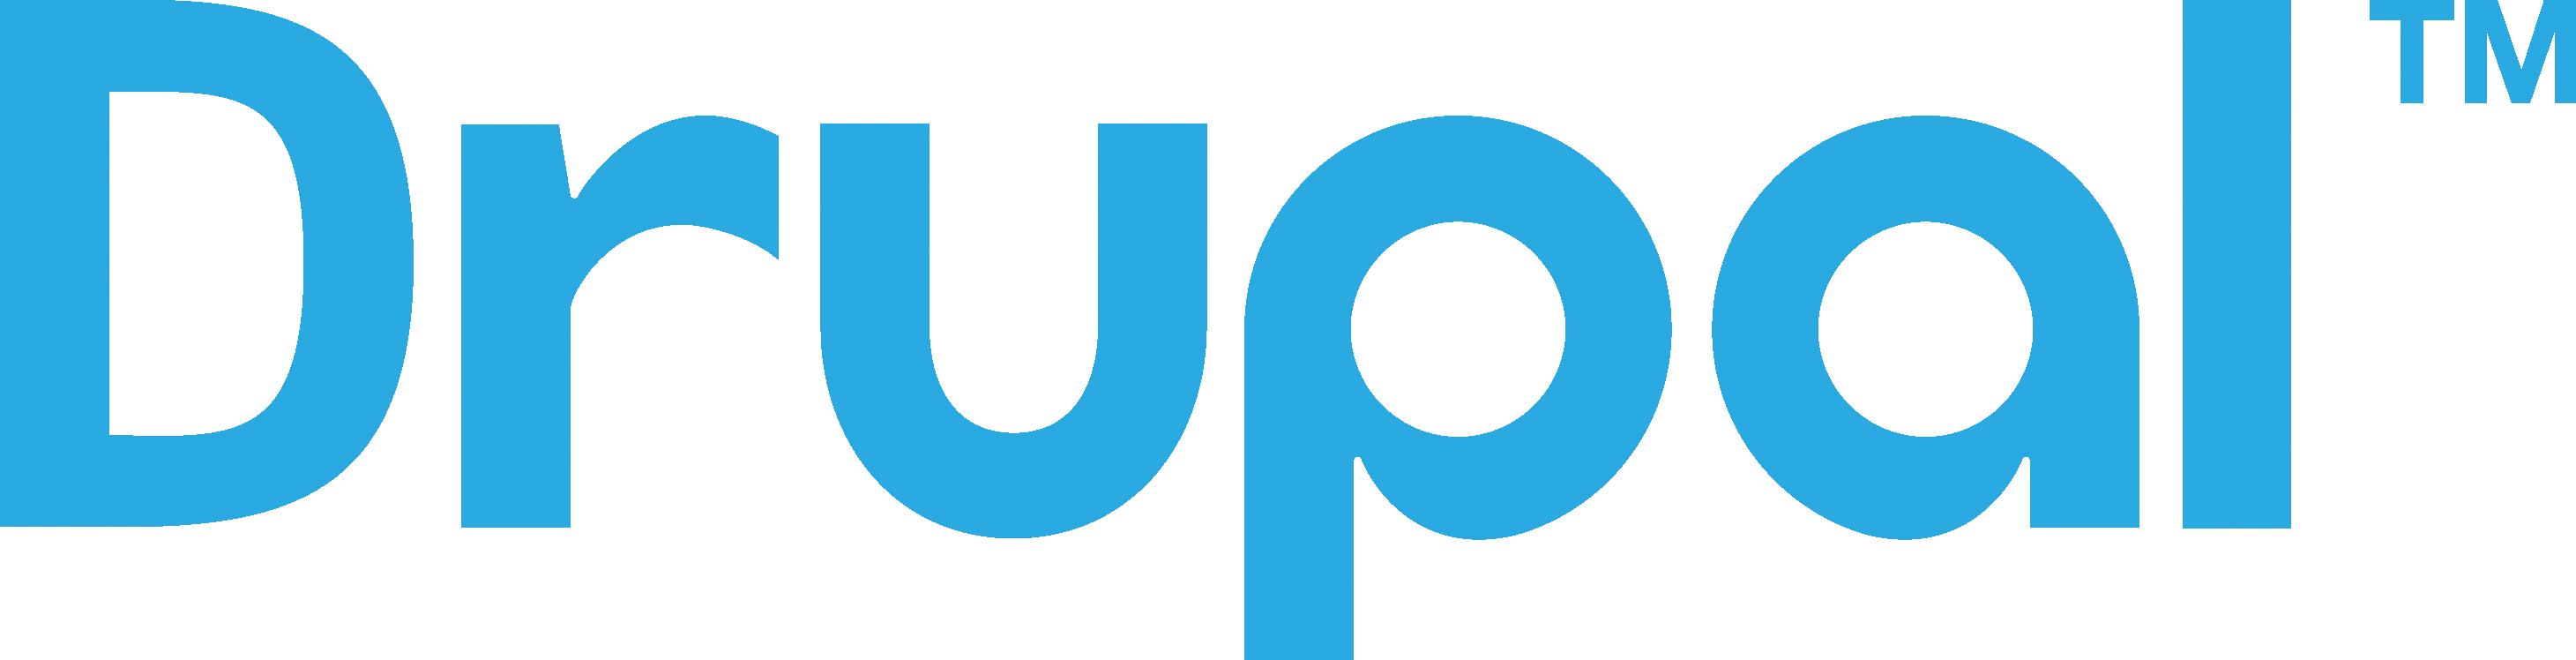 drupal_logo-blue_rgb